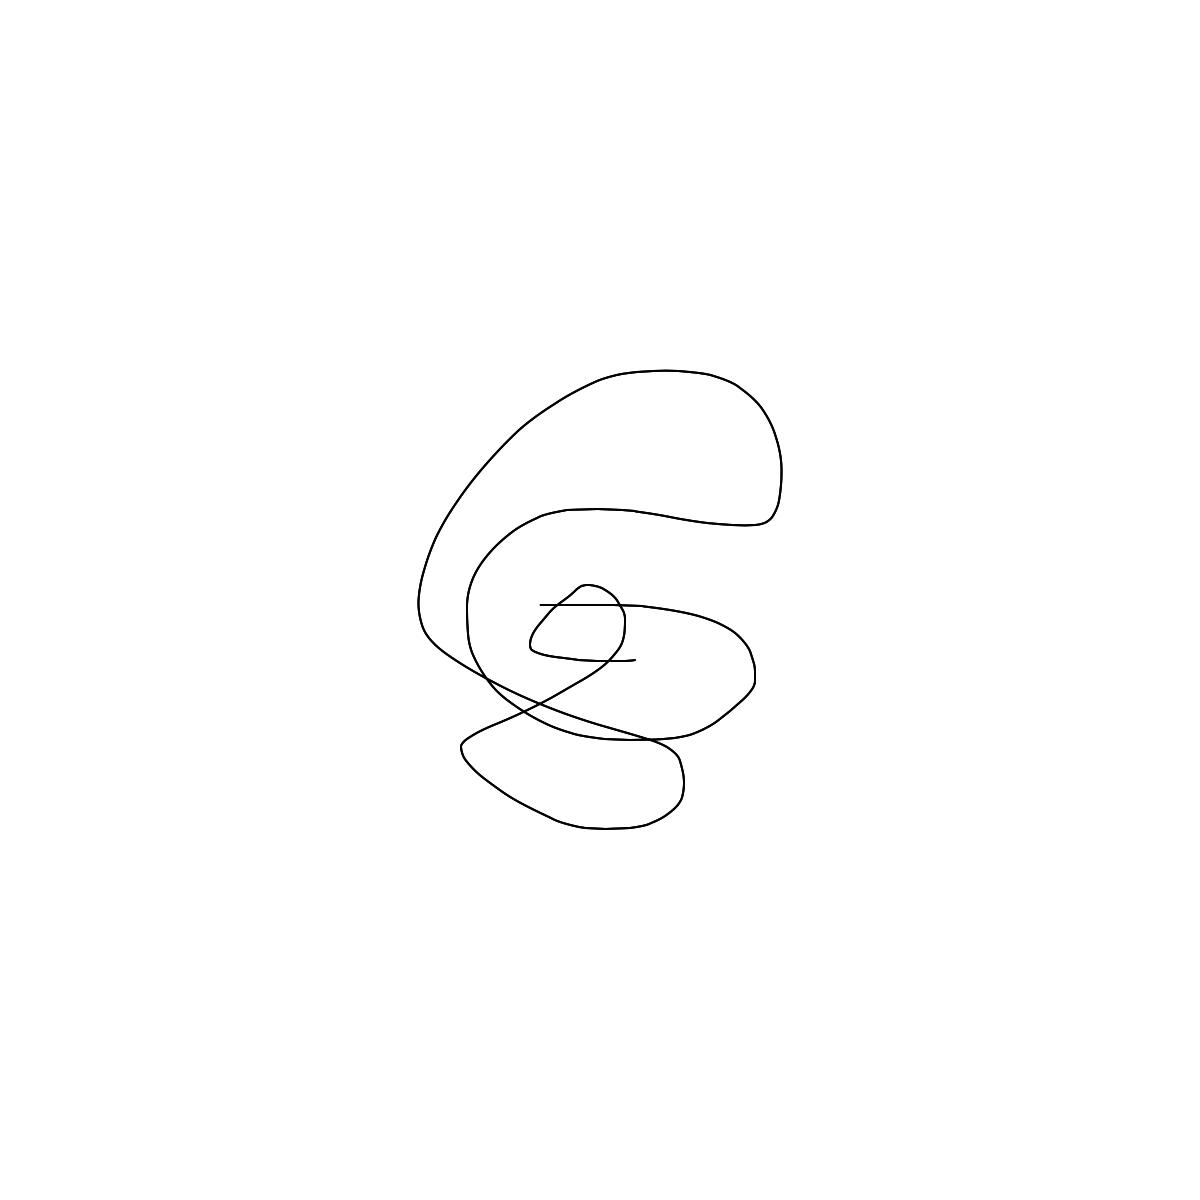 BAAAM drawing#830 lat:46.6606292724609400lng: 1.7922623157501220